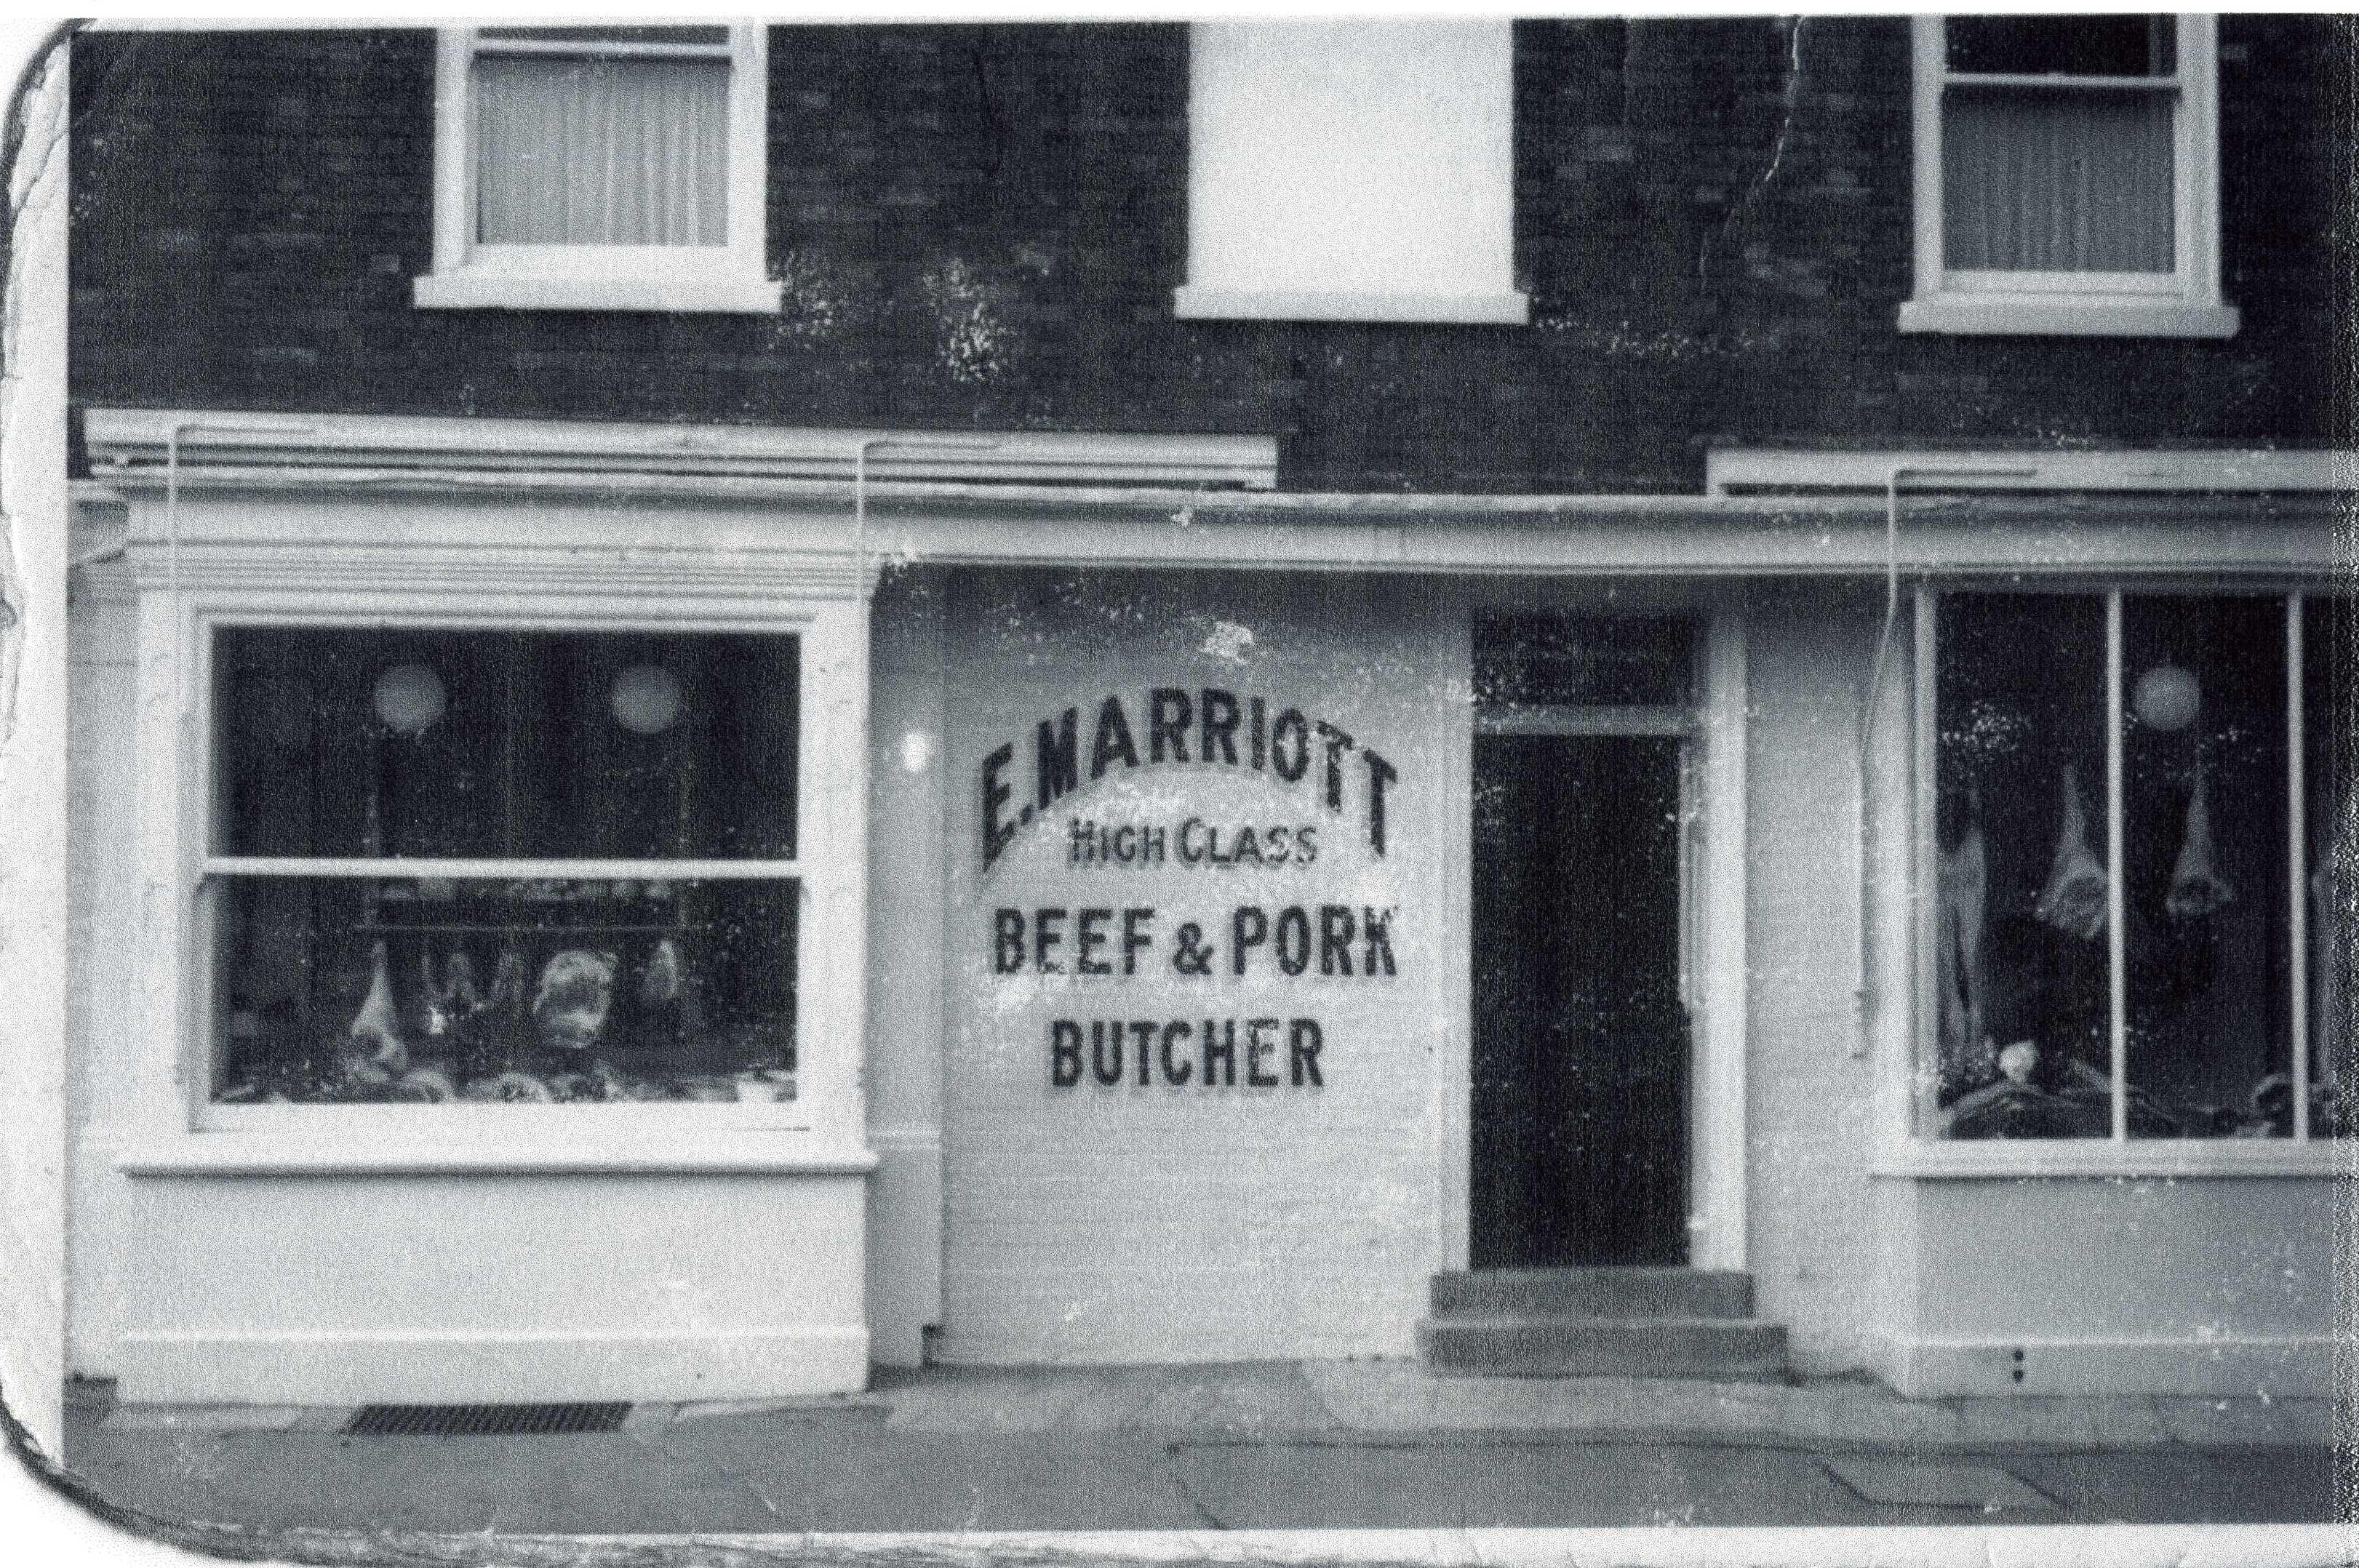 E. Marriott - Butchers